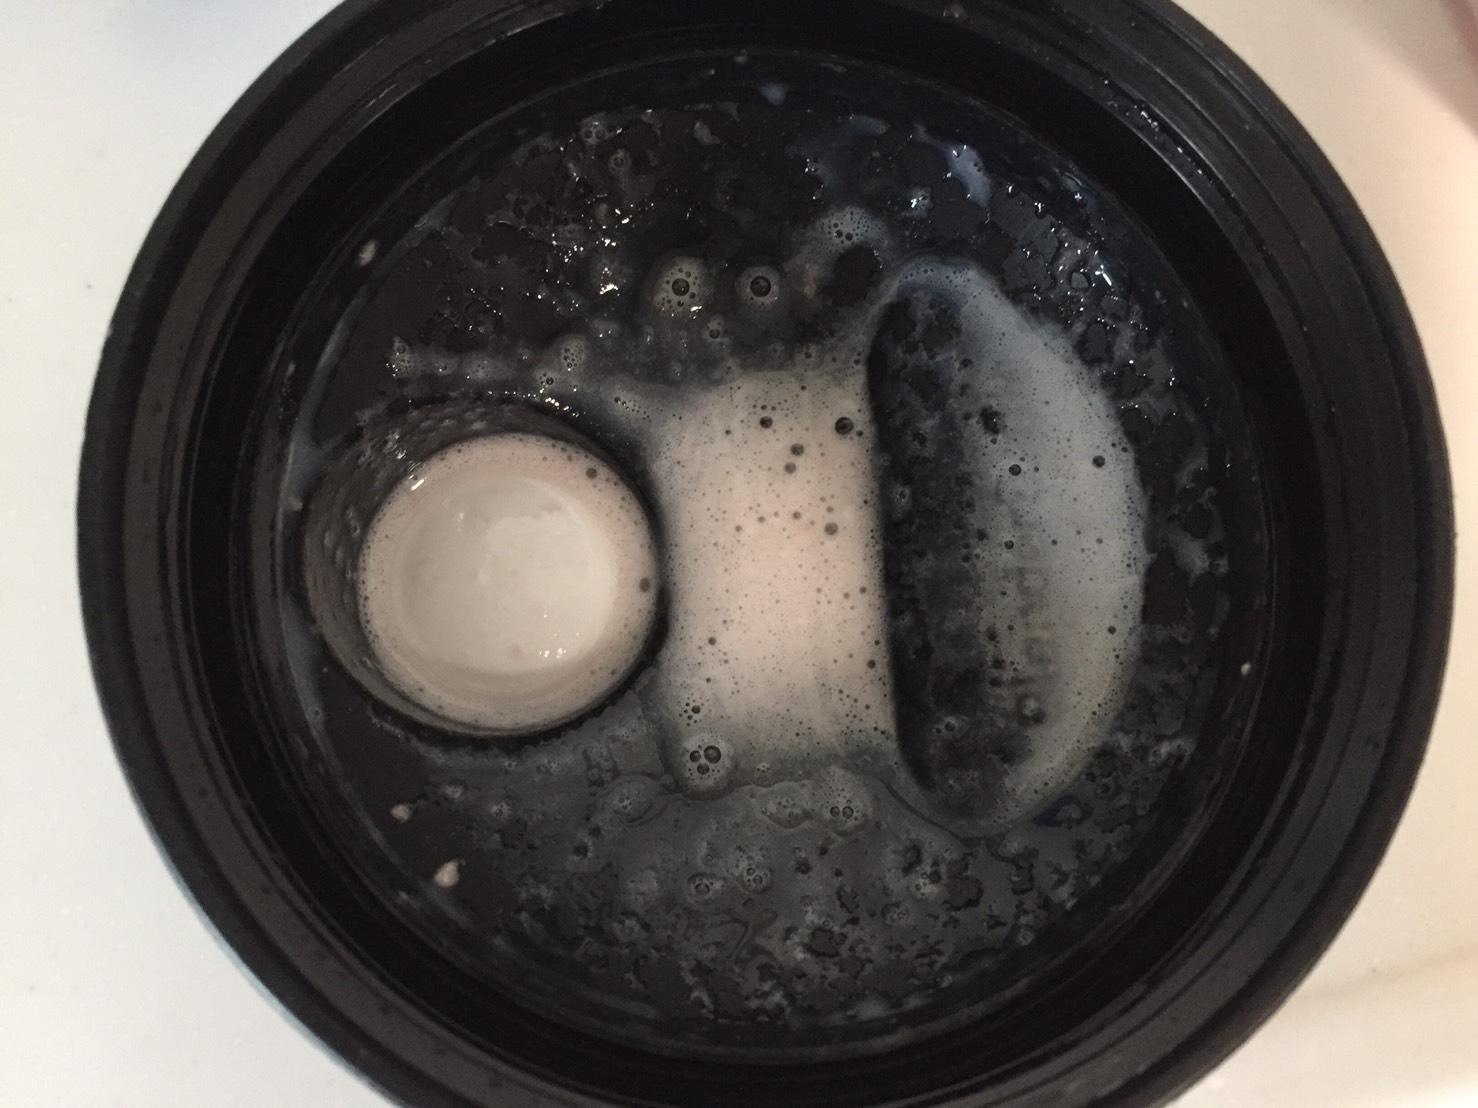 THEWHEY「STRAWBERRY MILKSHAKE FALVOUR(ストロベリーミルクシェイク味)」を溶かした蓋側